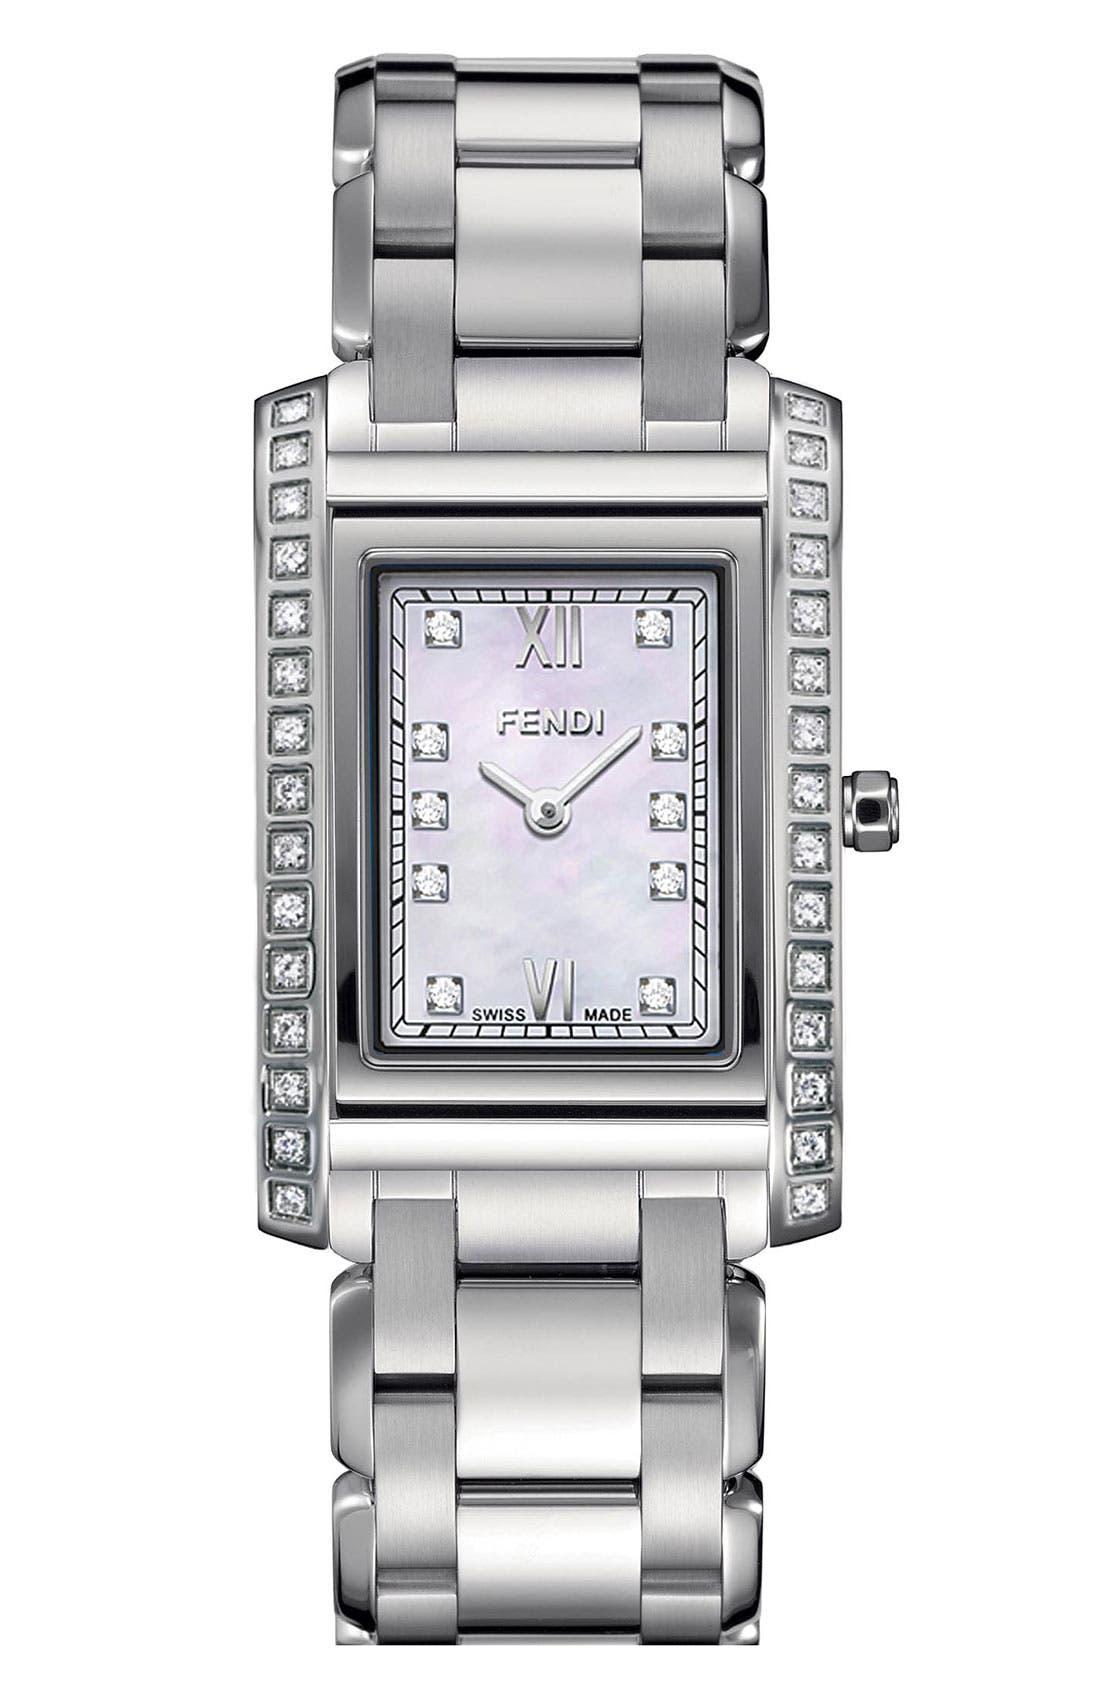 Main Image - Fendi 'Loop - Small' Diamond Bracelet Watch, 21mm x 34mm